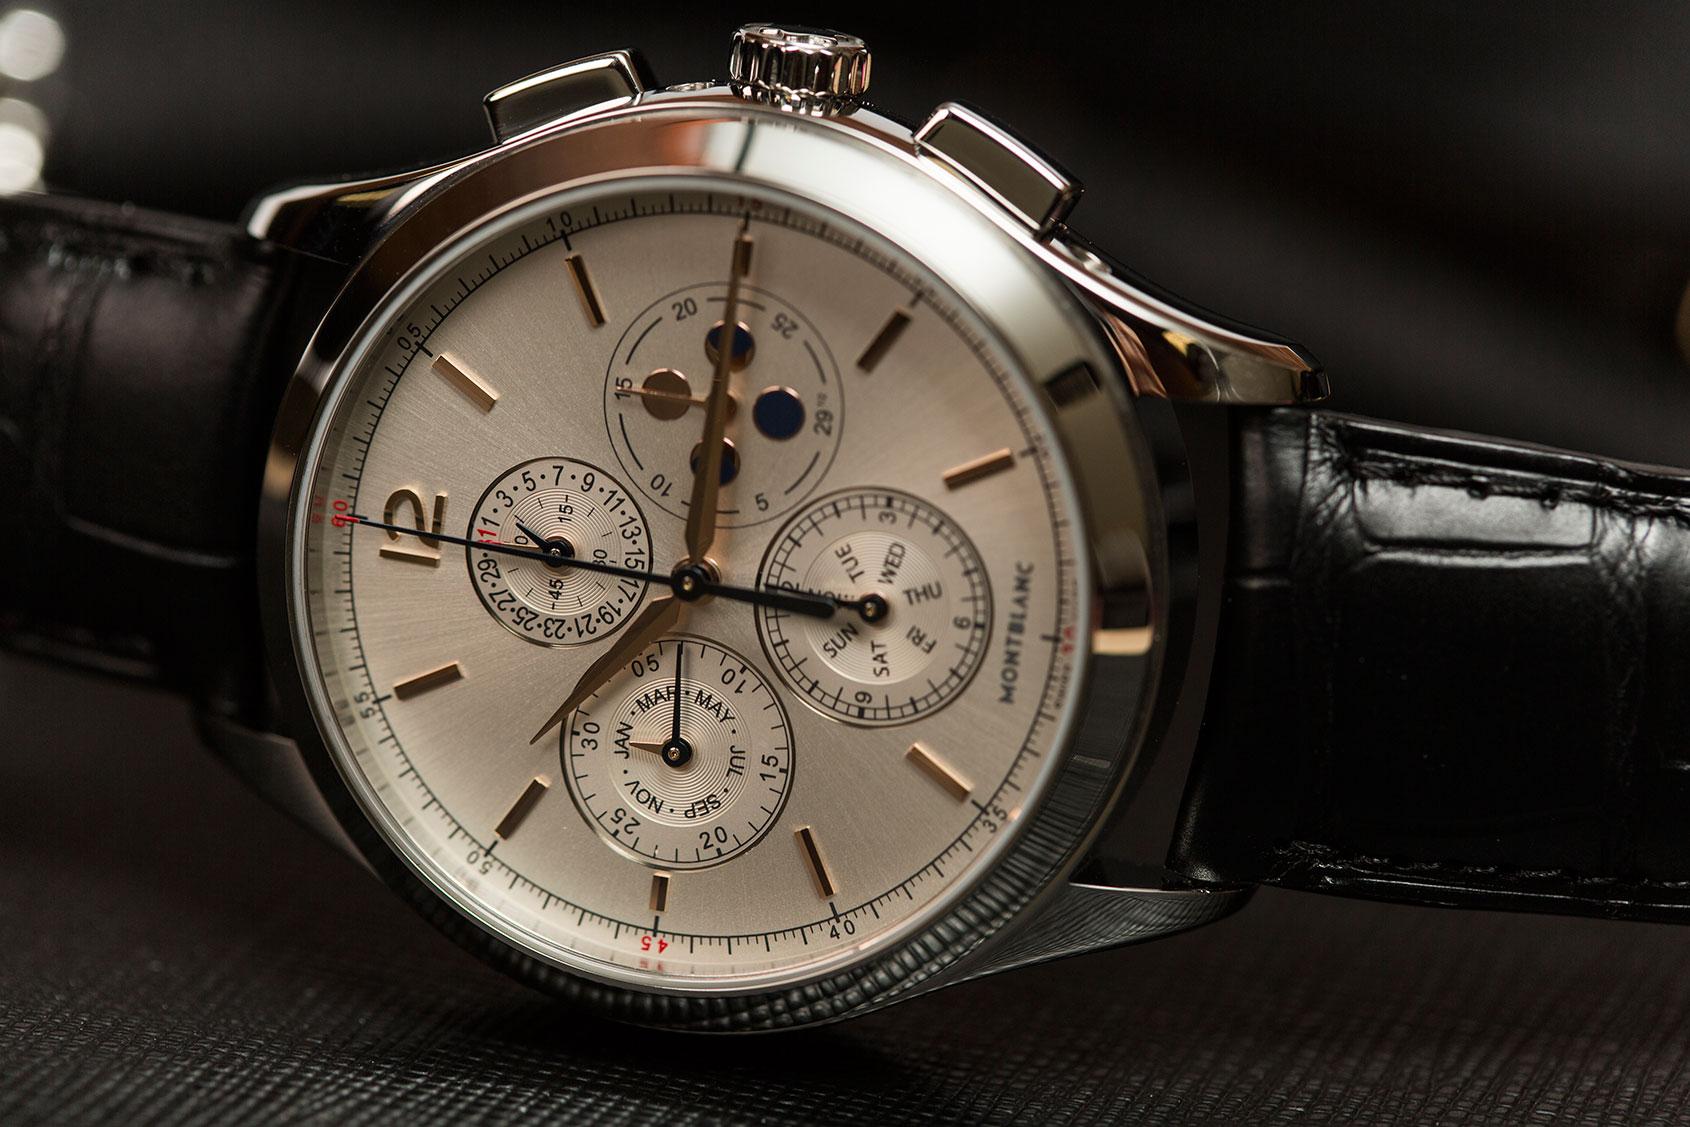 montblanc-heritage-chronometrie-annual-calendar-chronograph-6